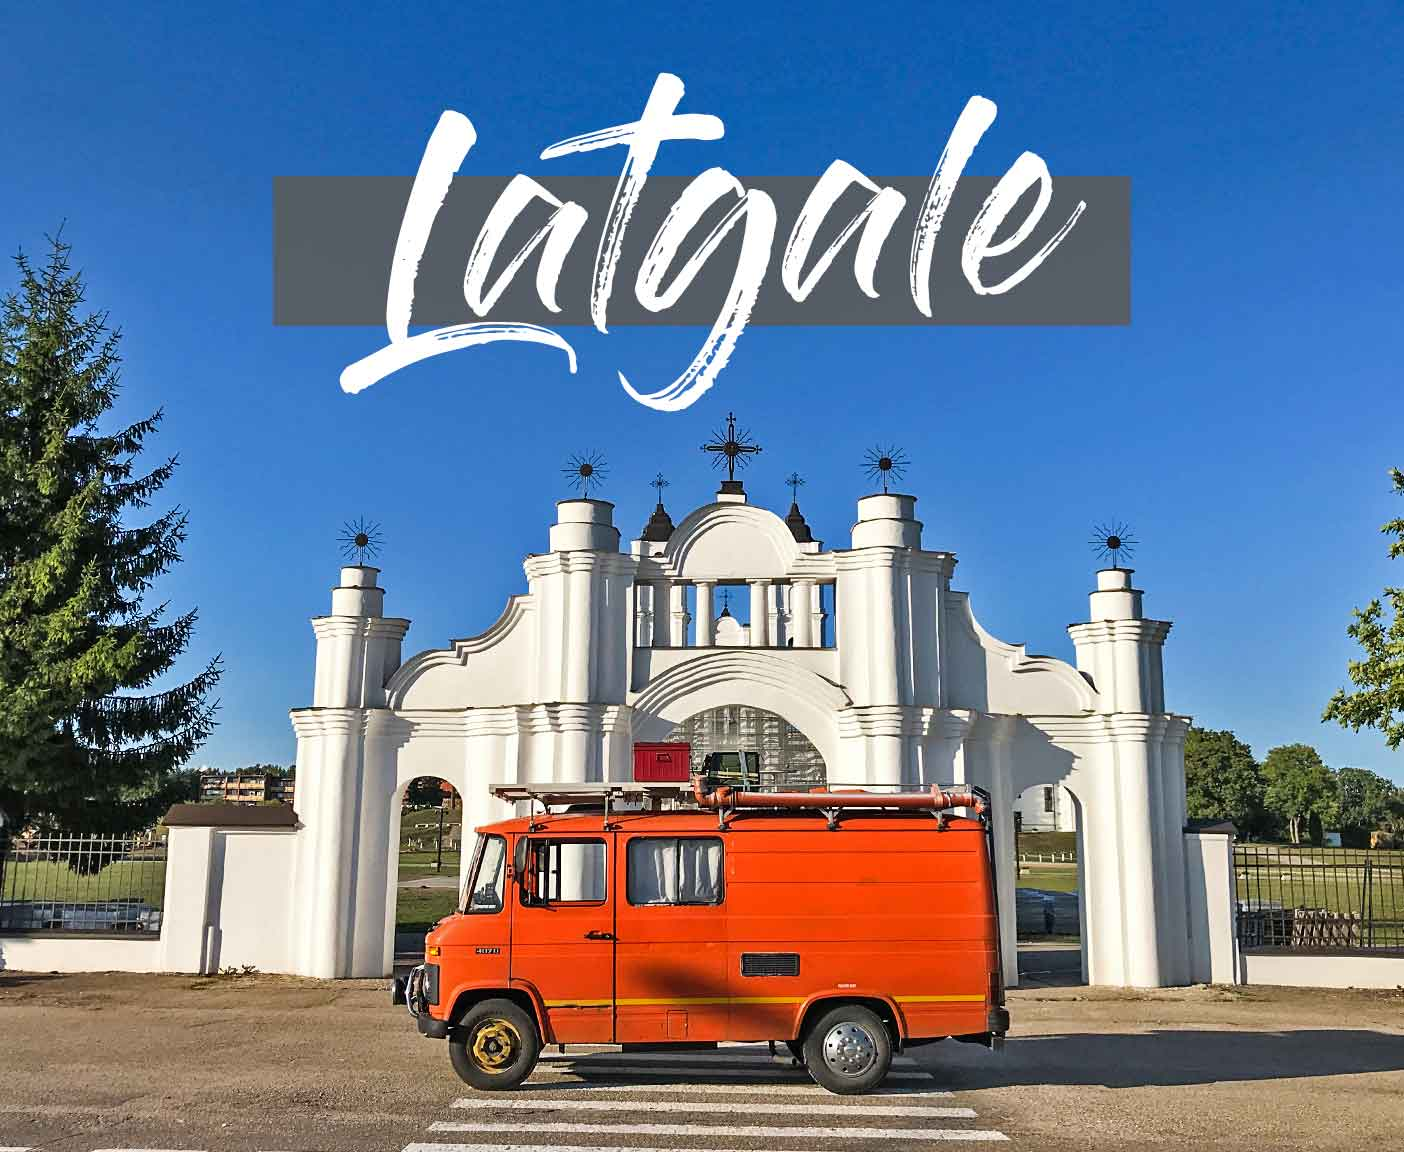 latgale-reisen-lettland-wohnmobil